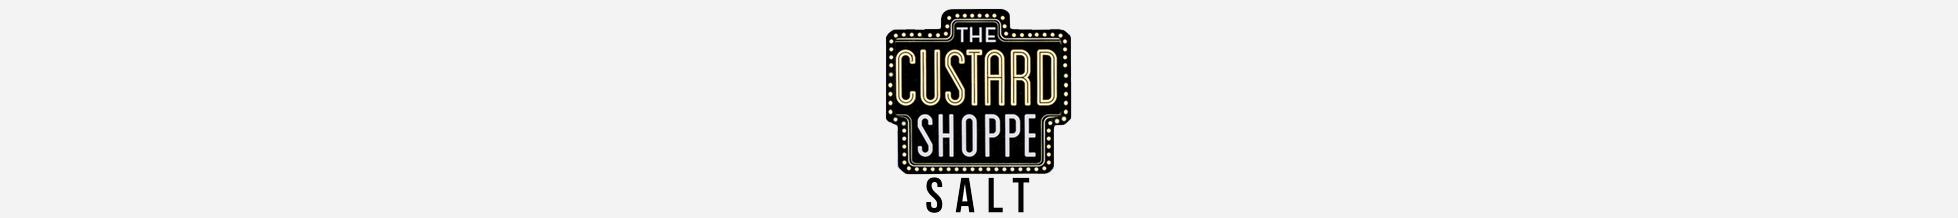 the-custard-shoppe-salt.jpg